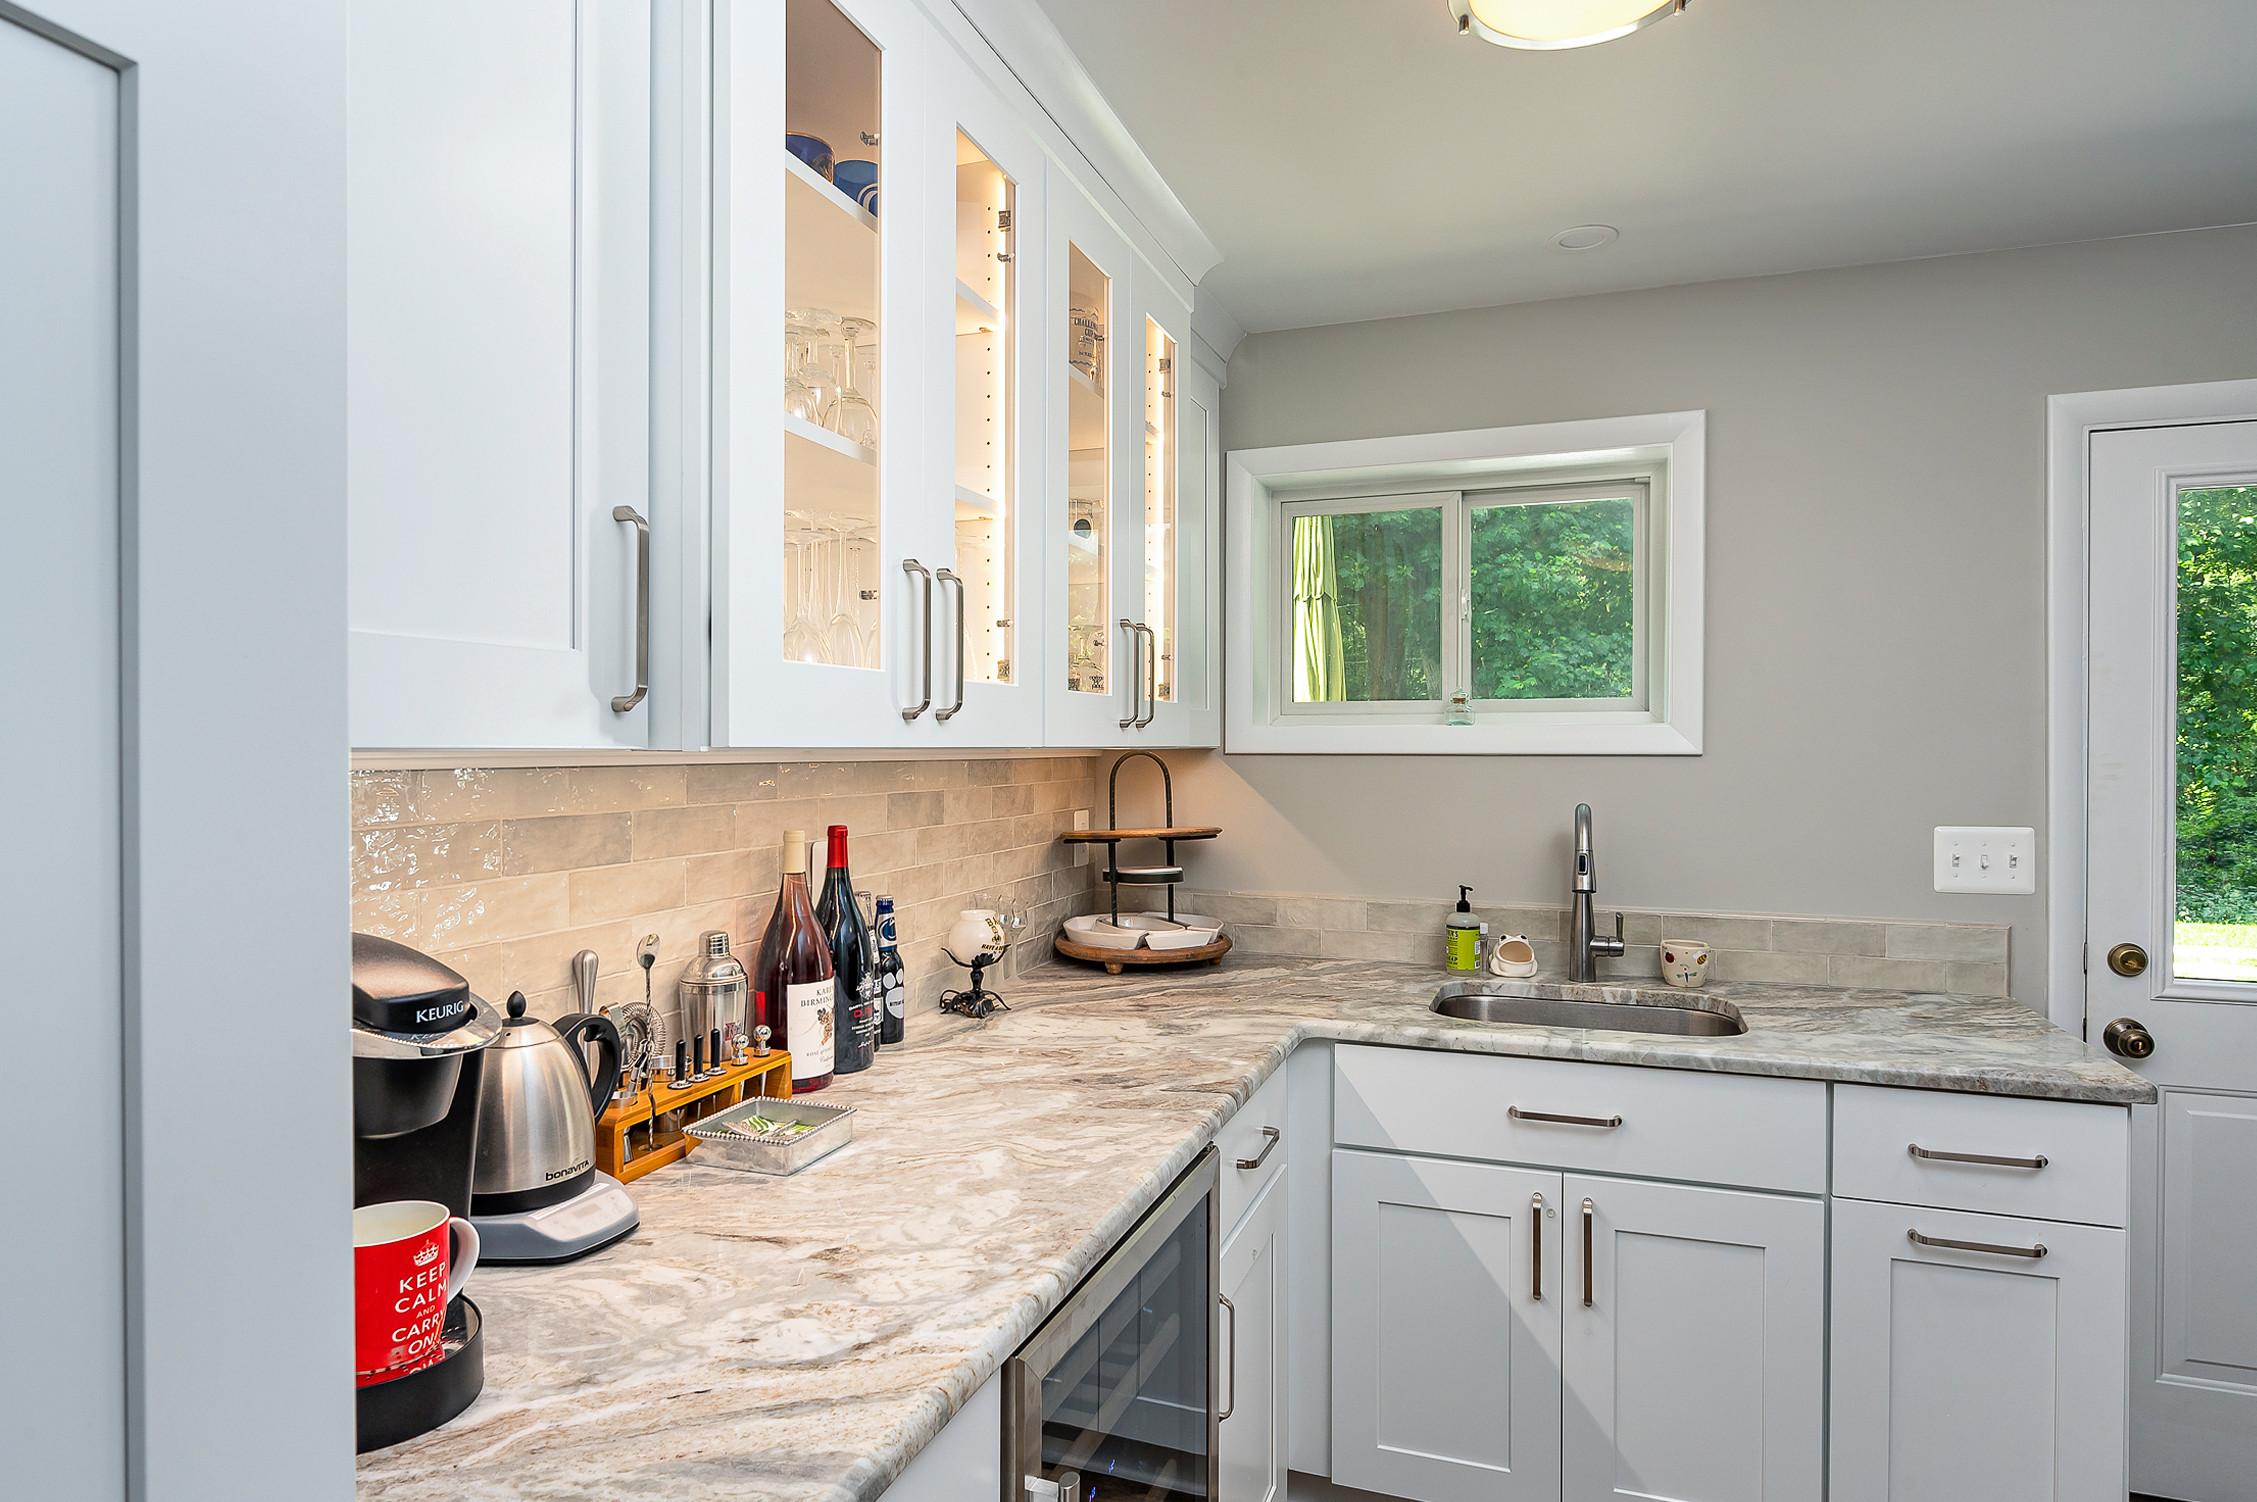 Davidsonville Kitchenette Remodel Project with bathroom